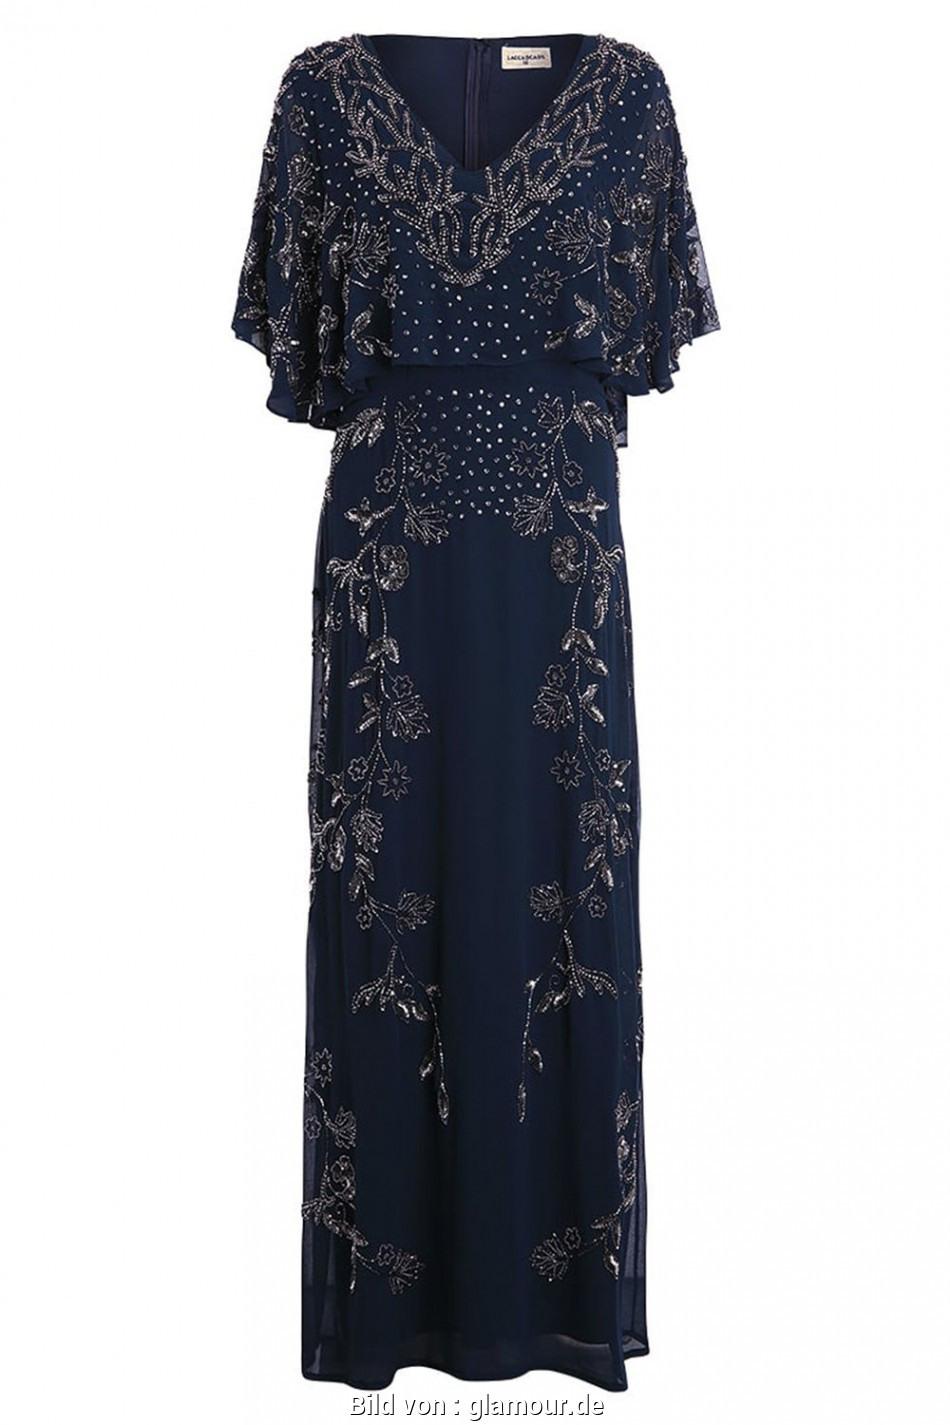 13 Wunderbar Abendkleid Zalando Lang Vertrieb Fantastisch Abendkleid Zalando Lang Bester Preis